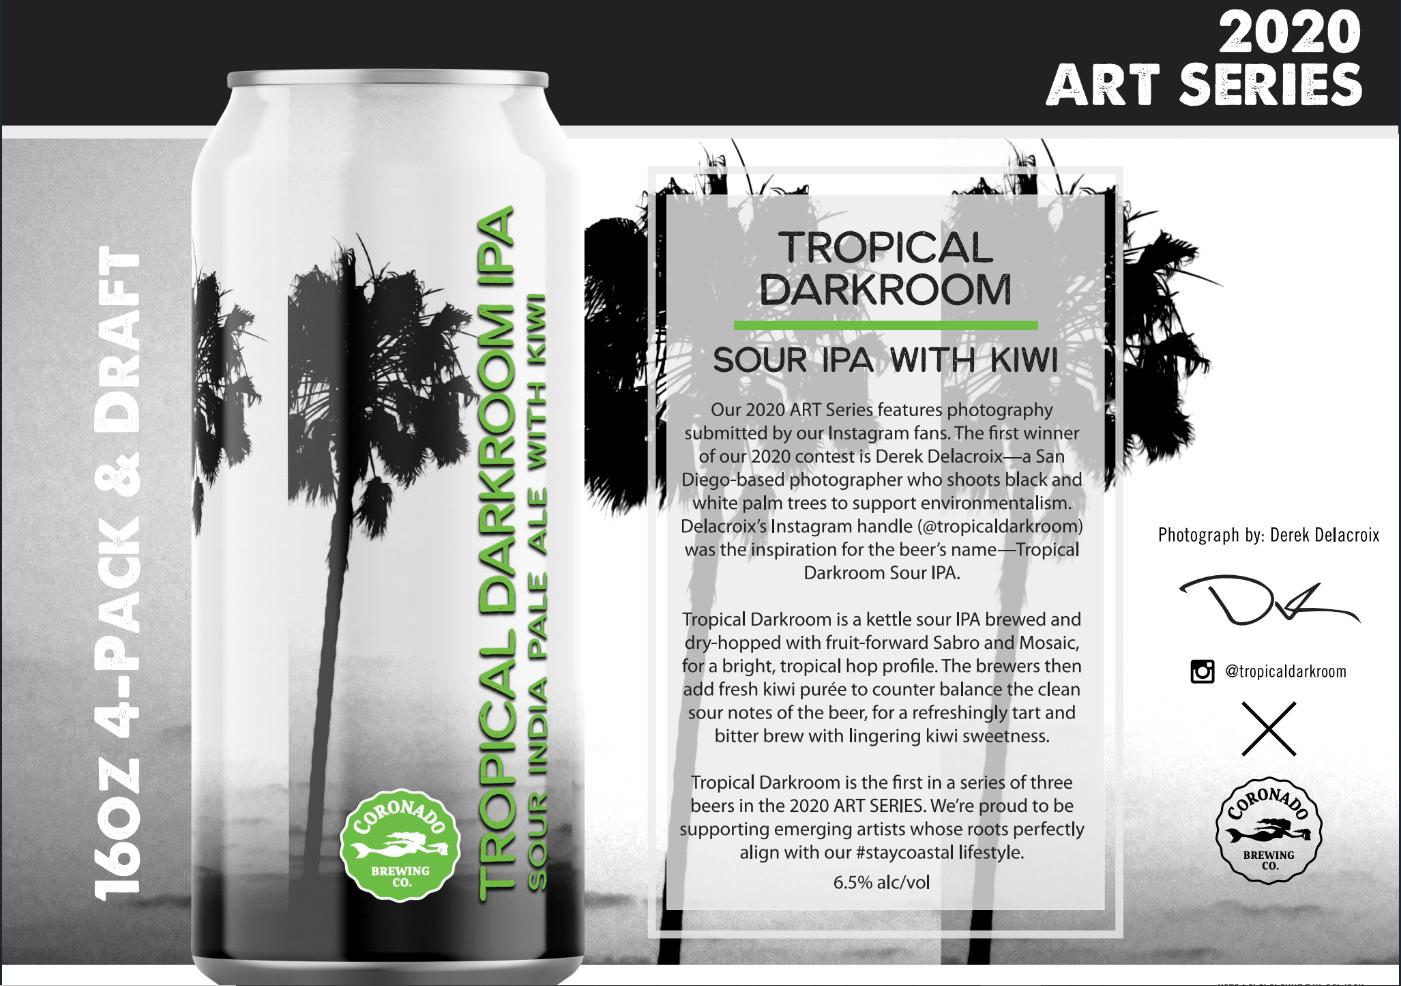 Coronado Brewing 2020 Art Series